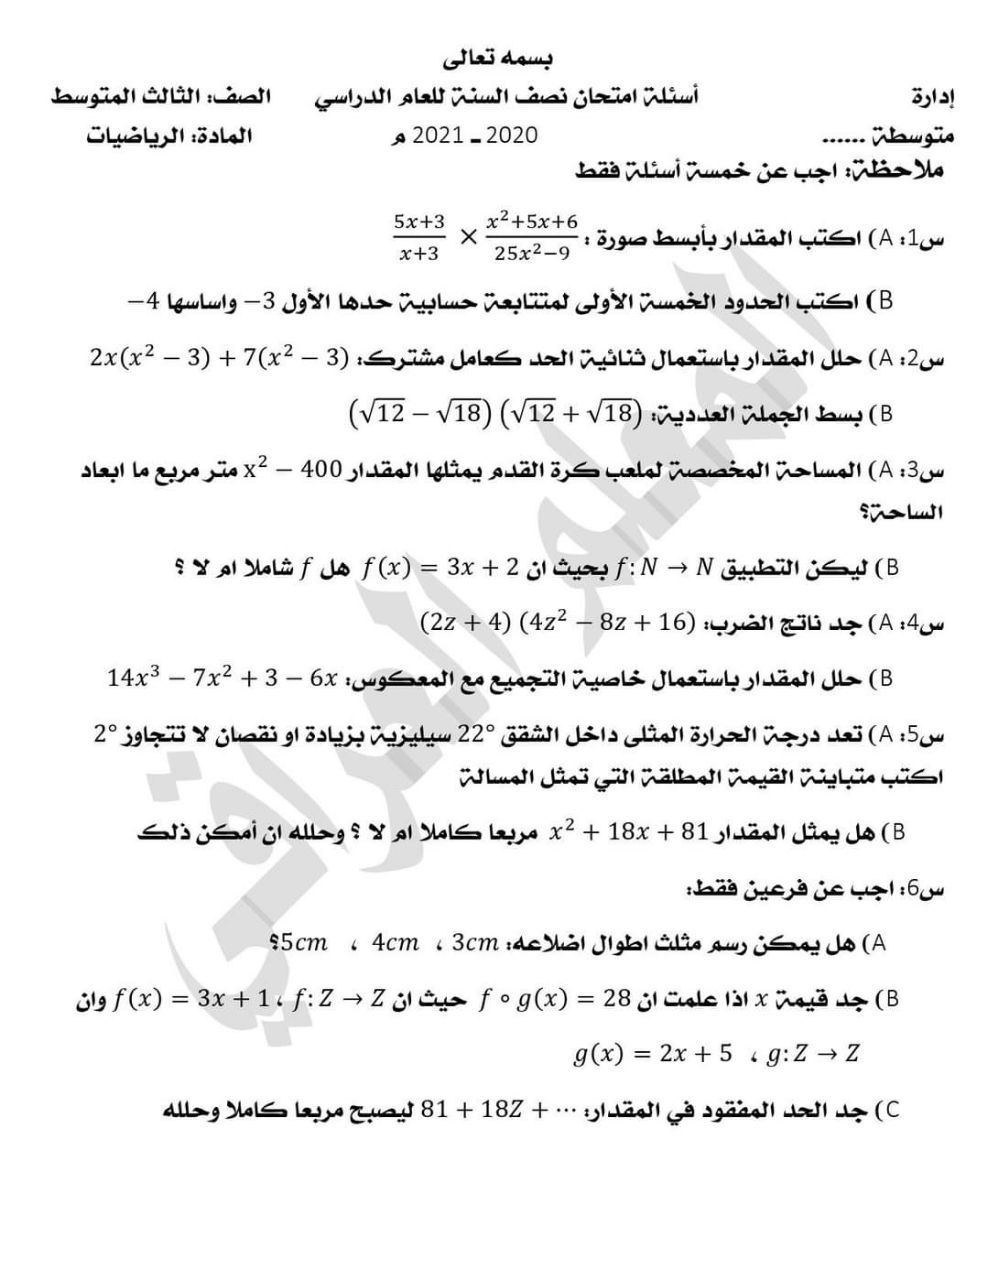 Pin On مواضيع الدراسة الاستاذ احمد مهدي شلال